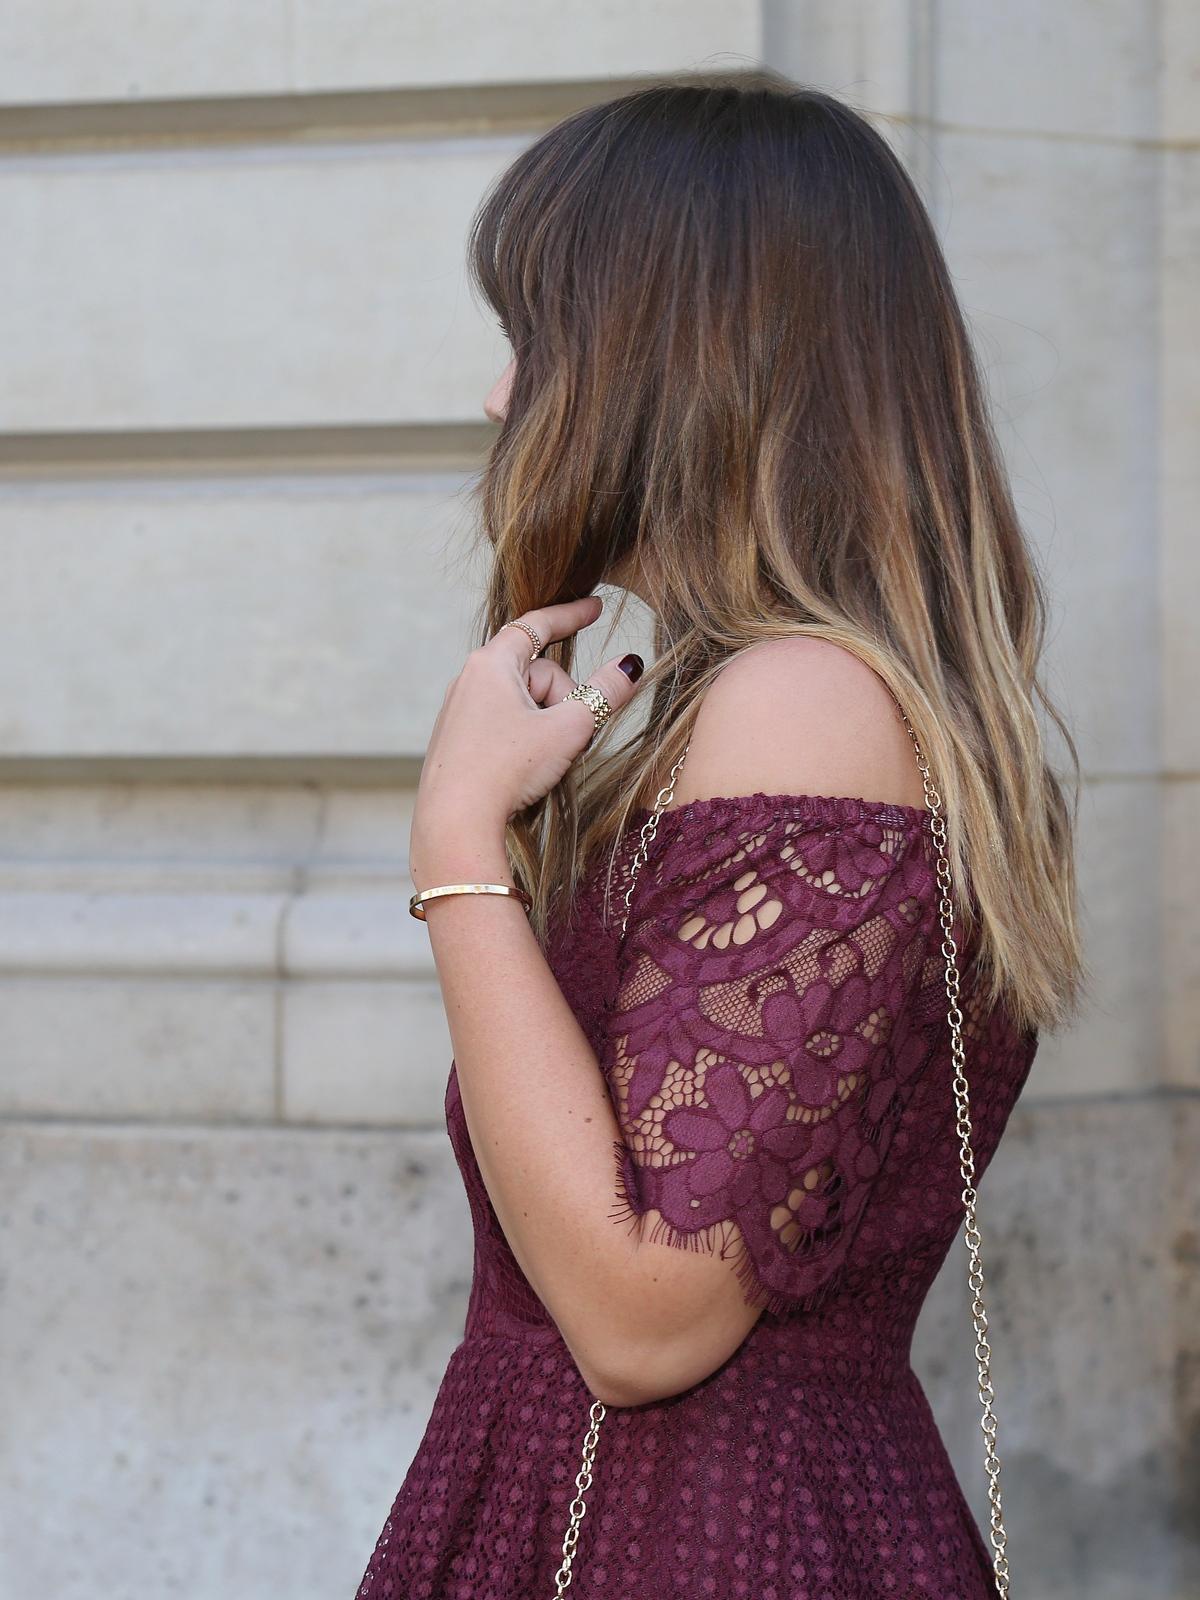 robe dentelle bordeaux - boohoo - girls night - party - robe de soirée